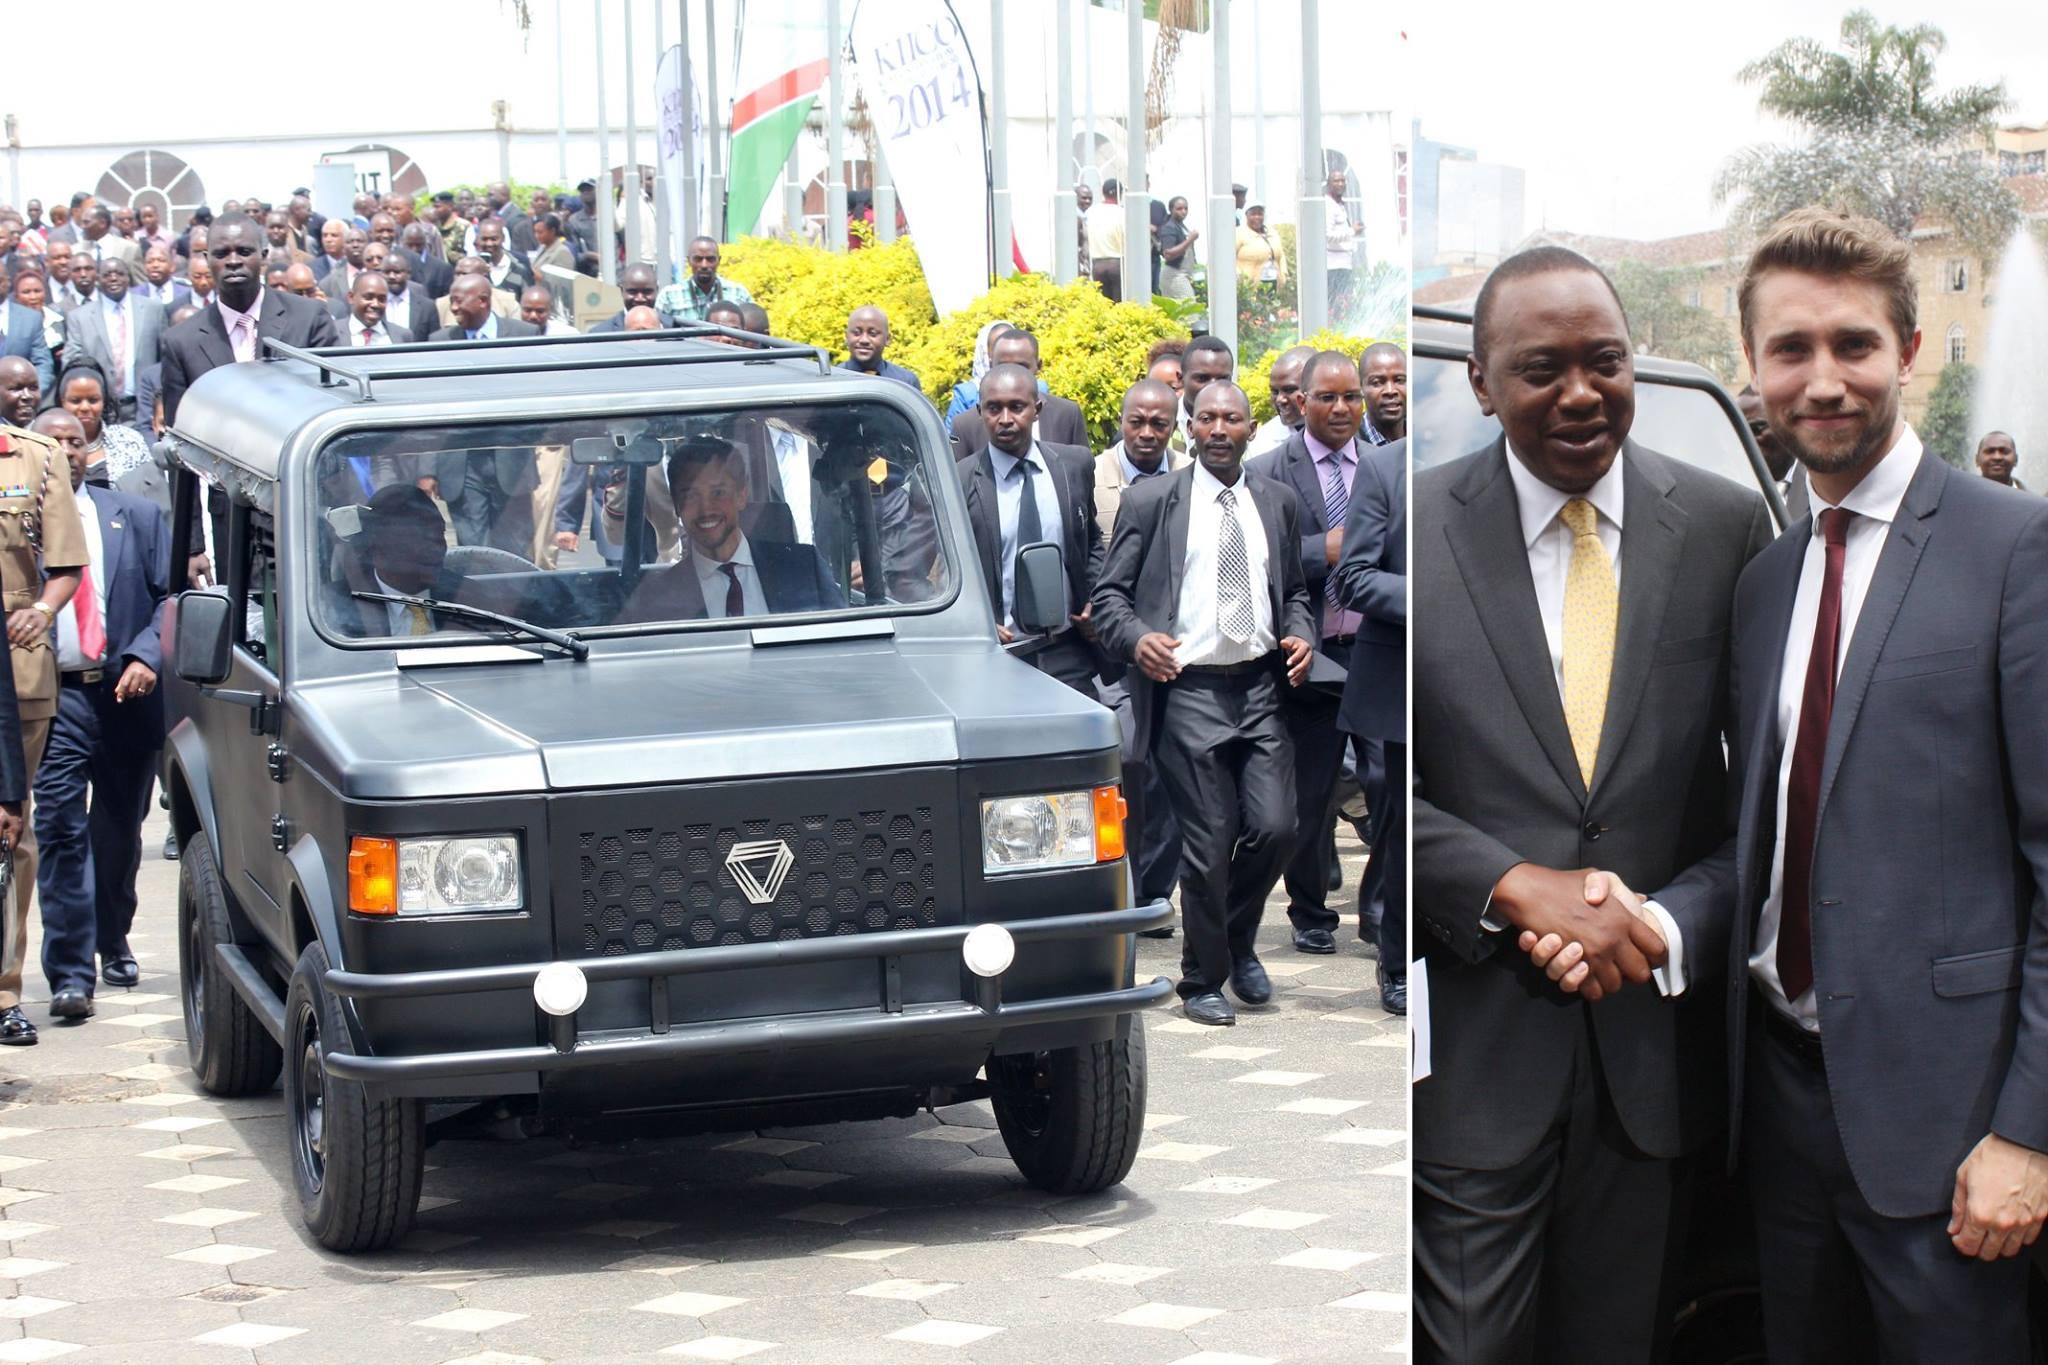 Kenyan President Uhuru Kenyatta had a special test drive of a Mobius car in 2014